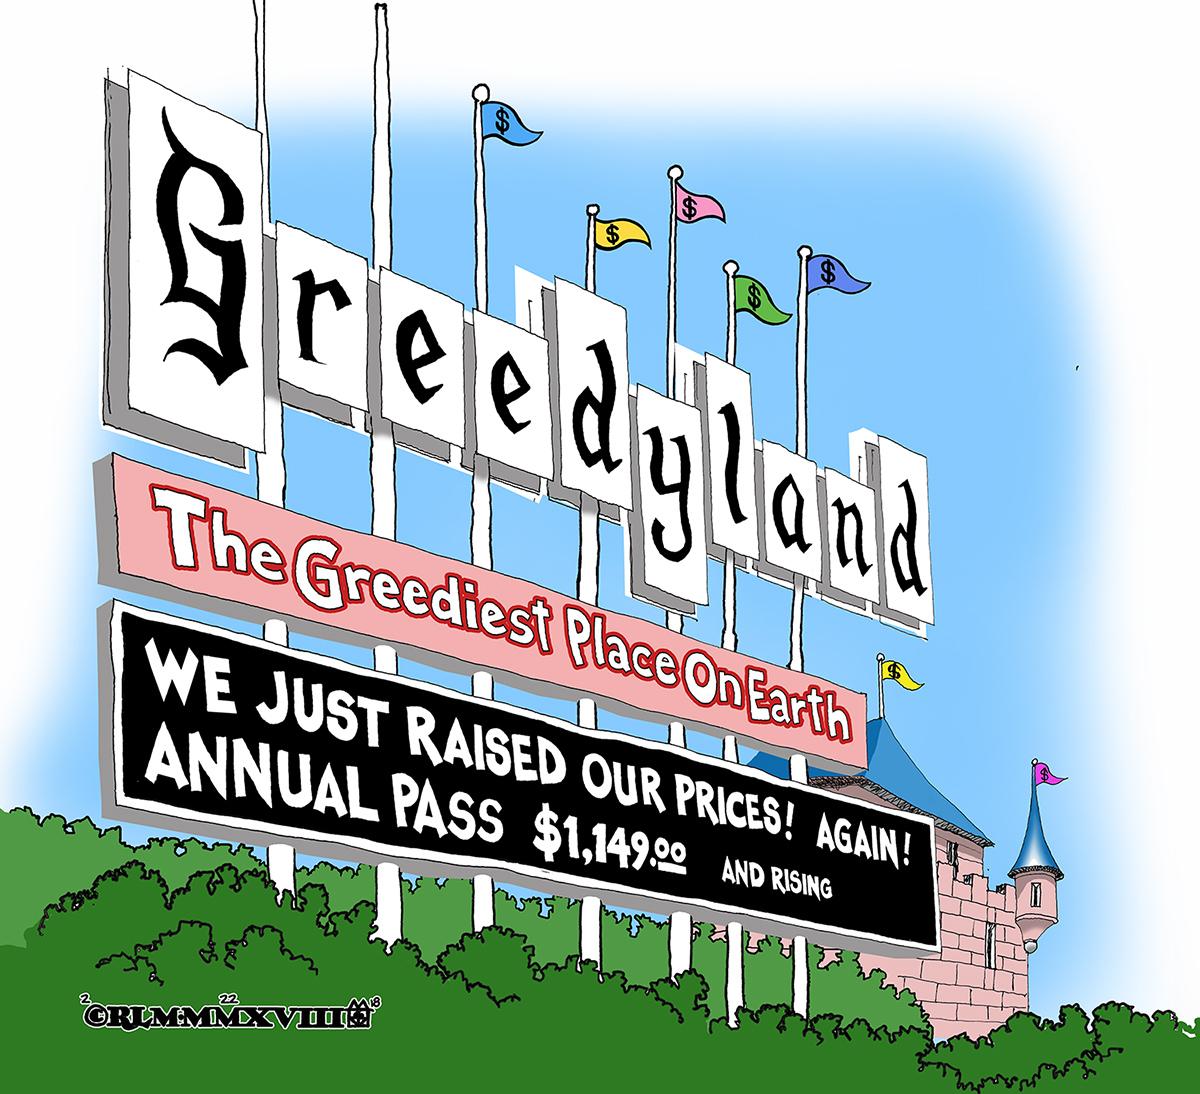 GREEDYLAND